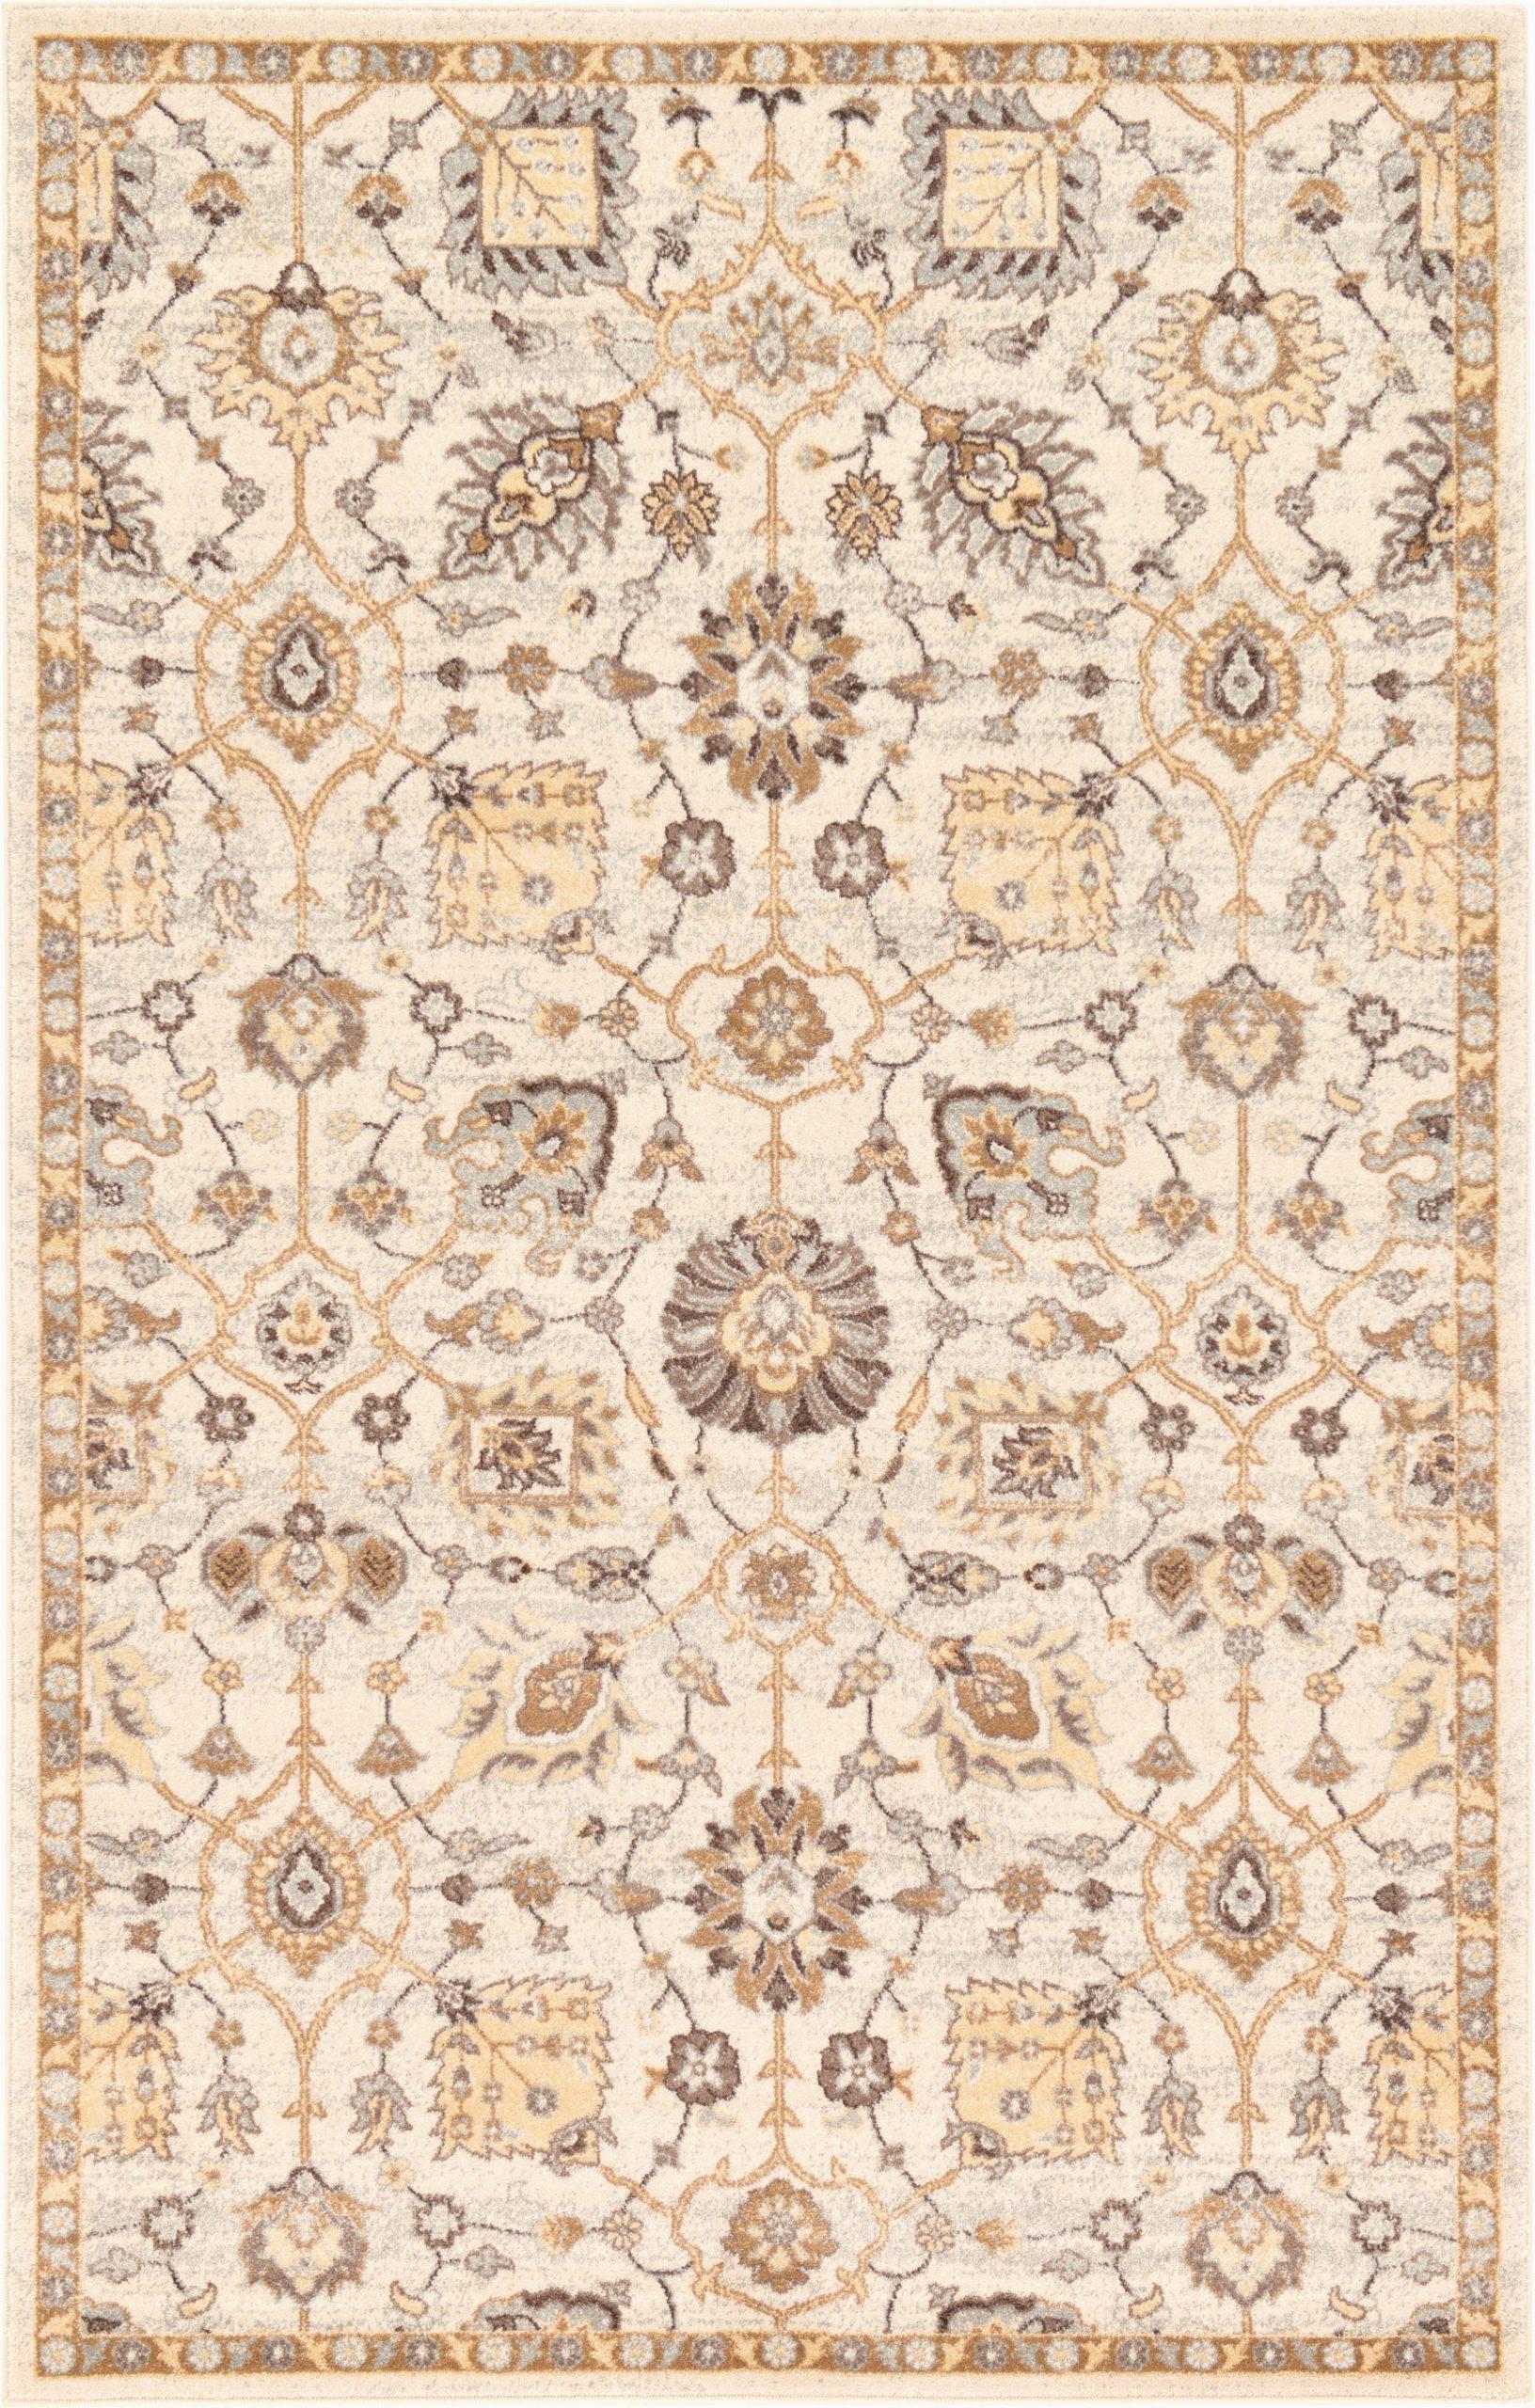 fulmore oriental ivorybeigebrown area rug